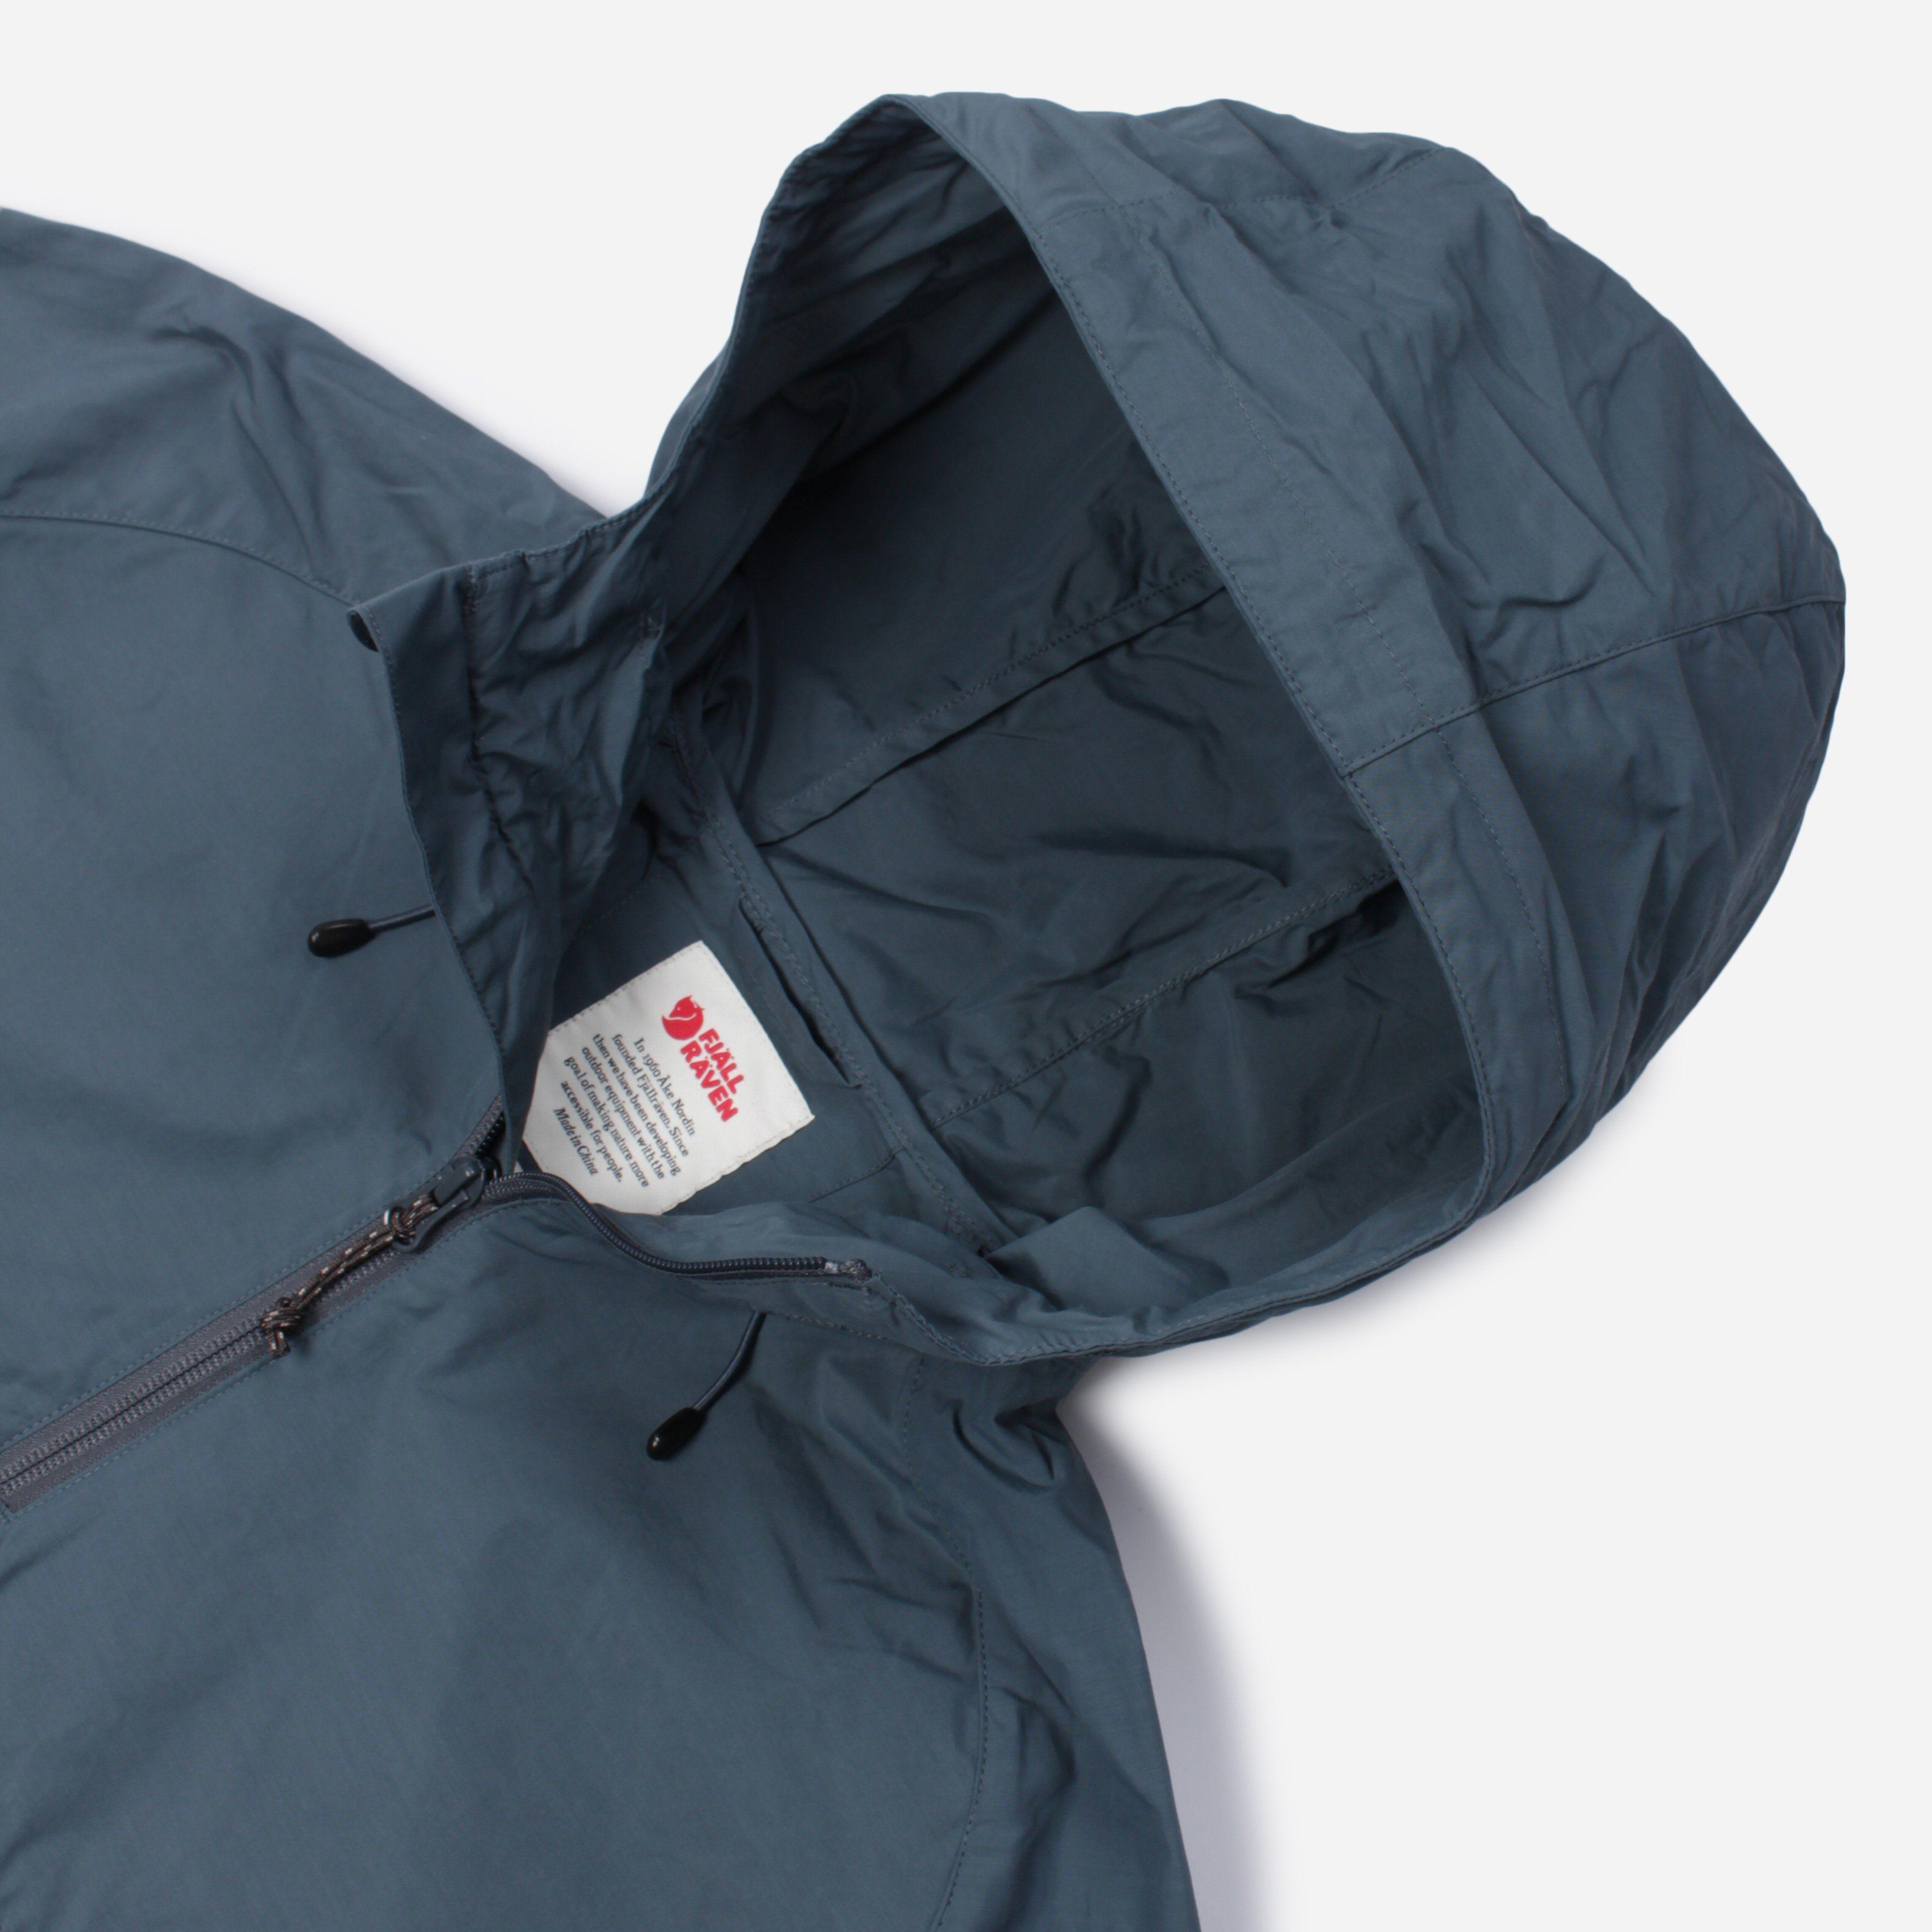 Fjallraven High Coast Anorak Jacket